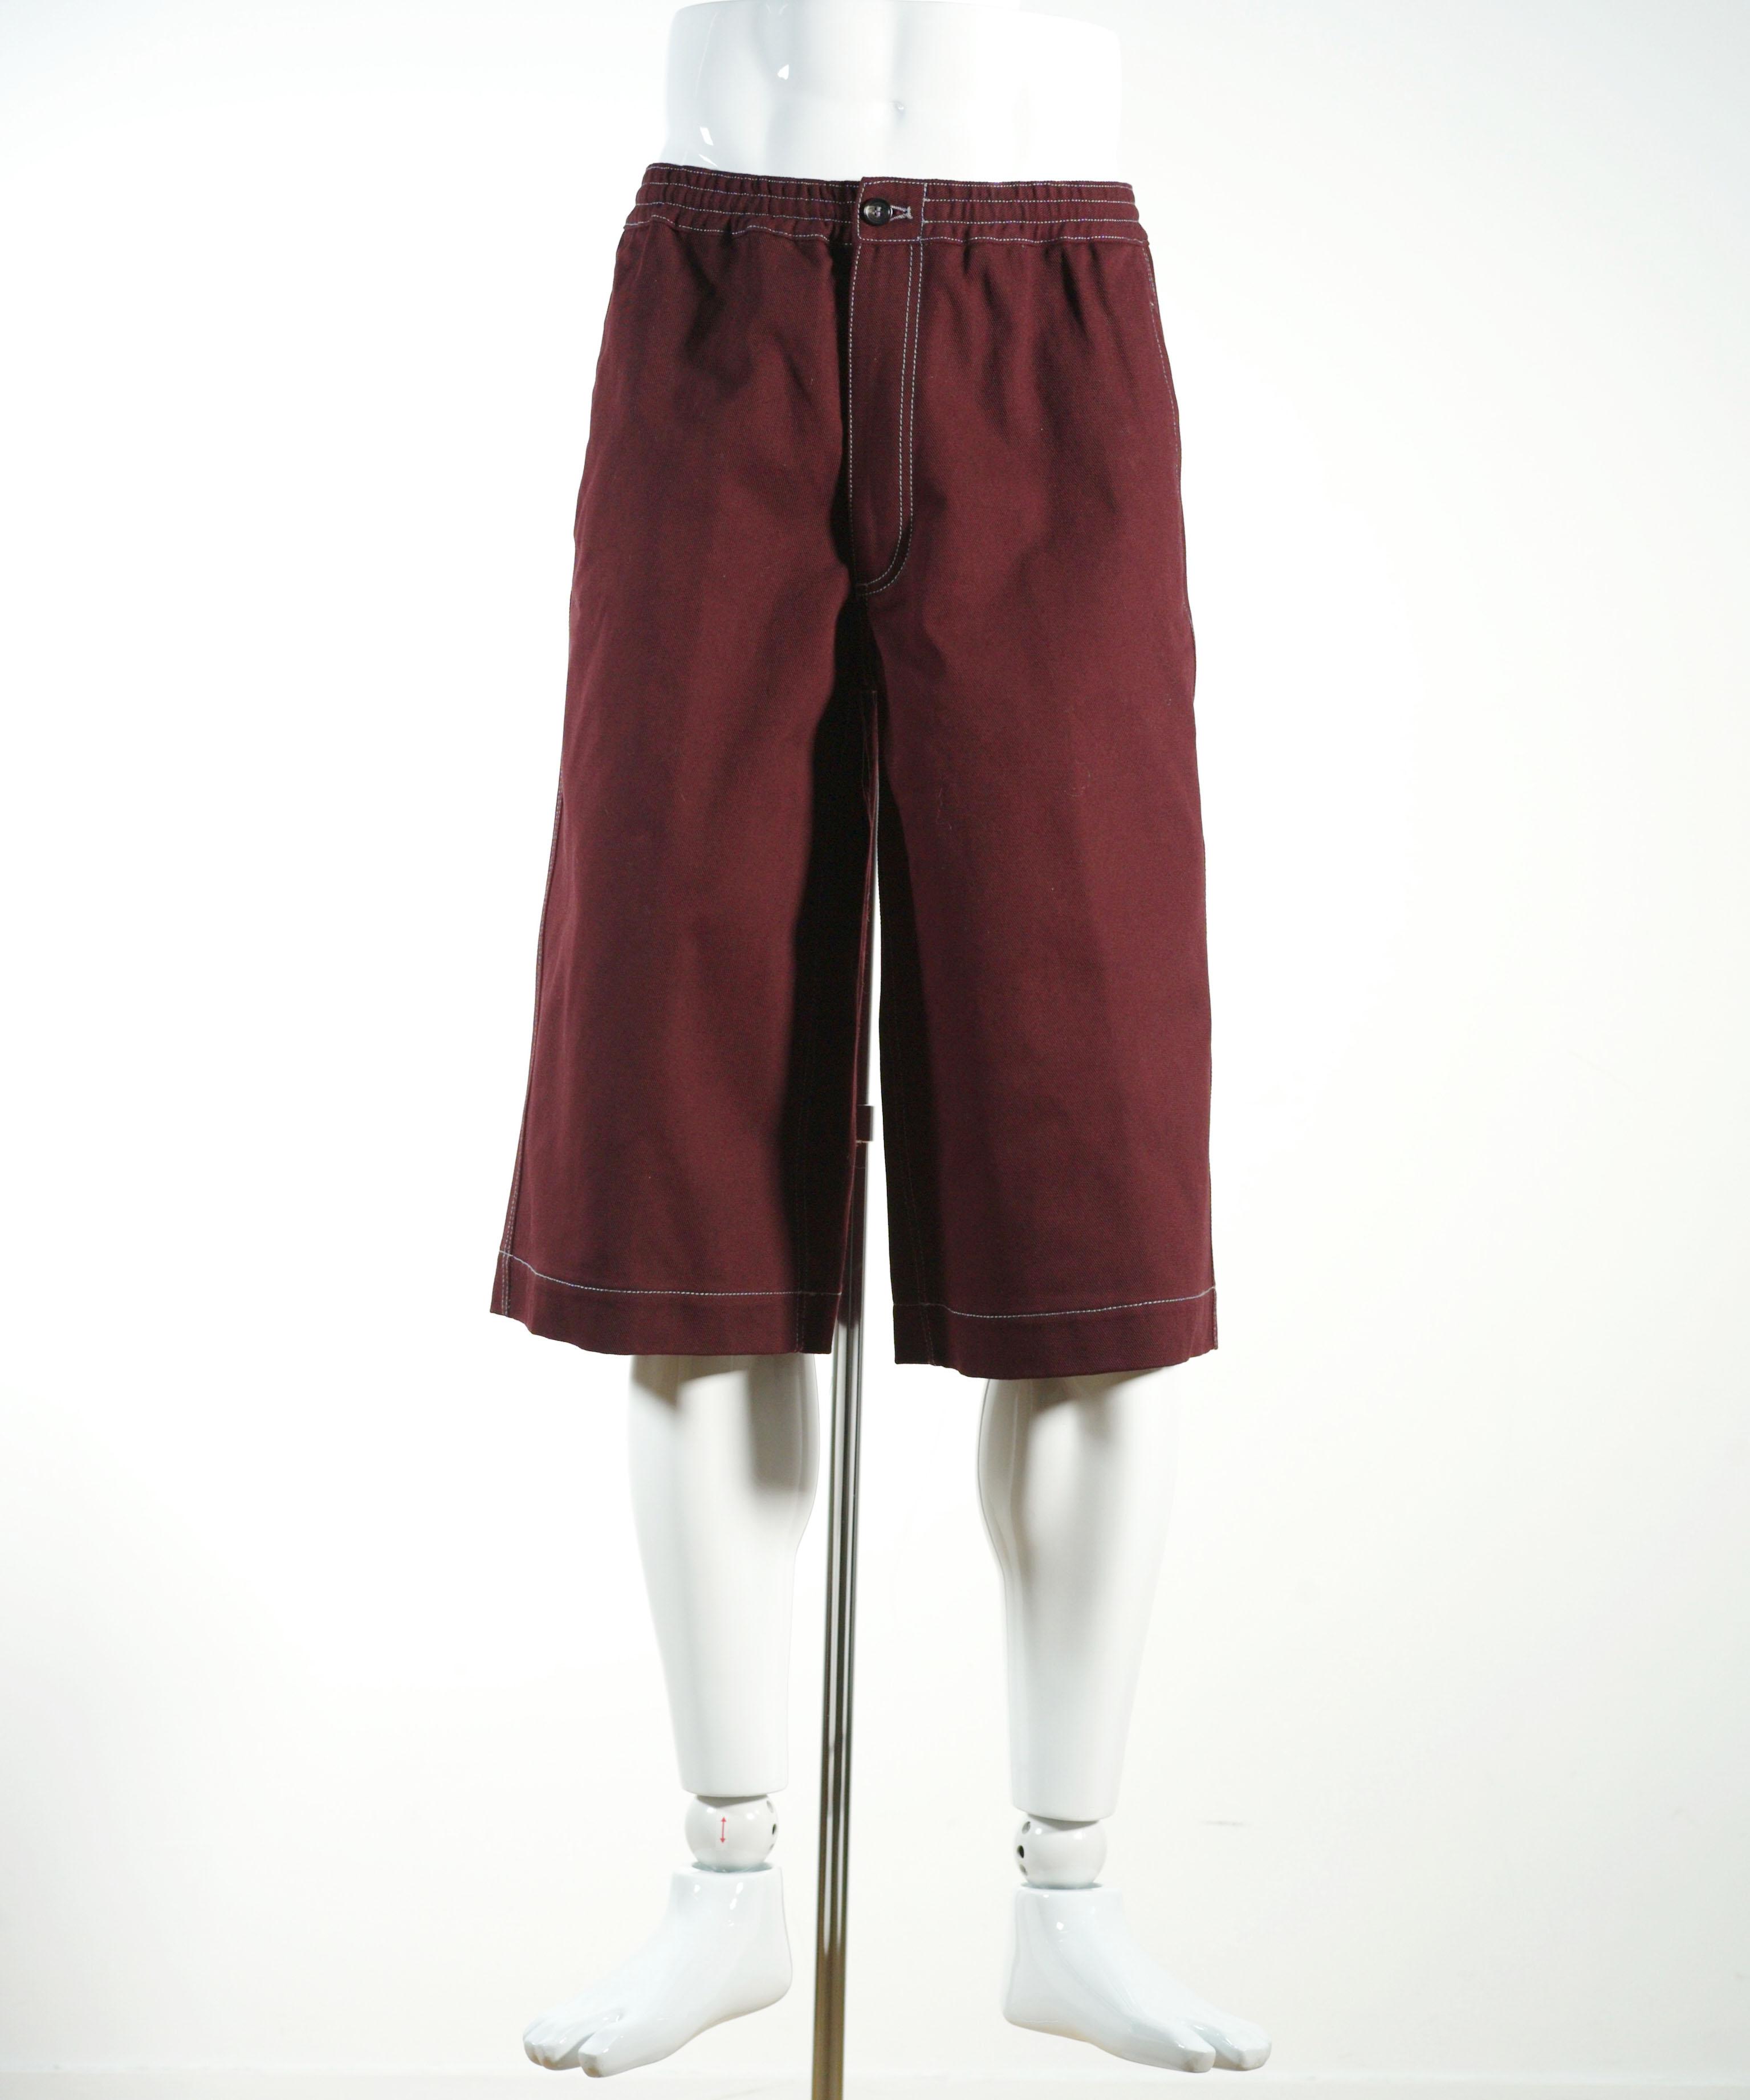 MARNI COTTON DRILL SHORT PANTS